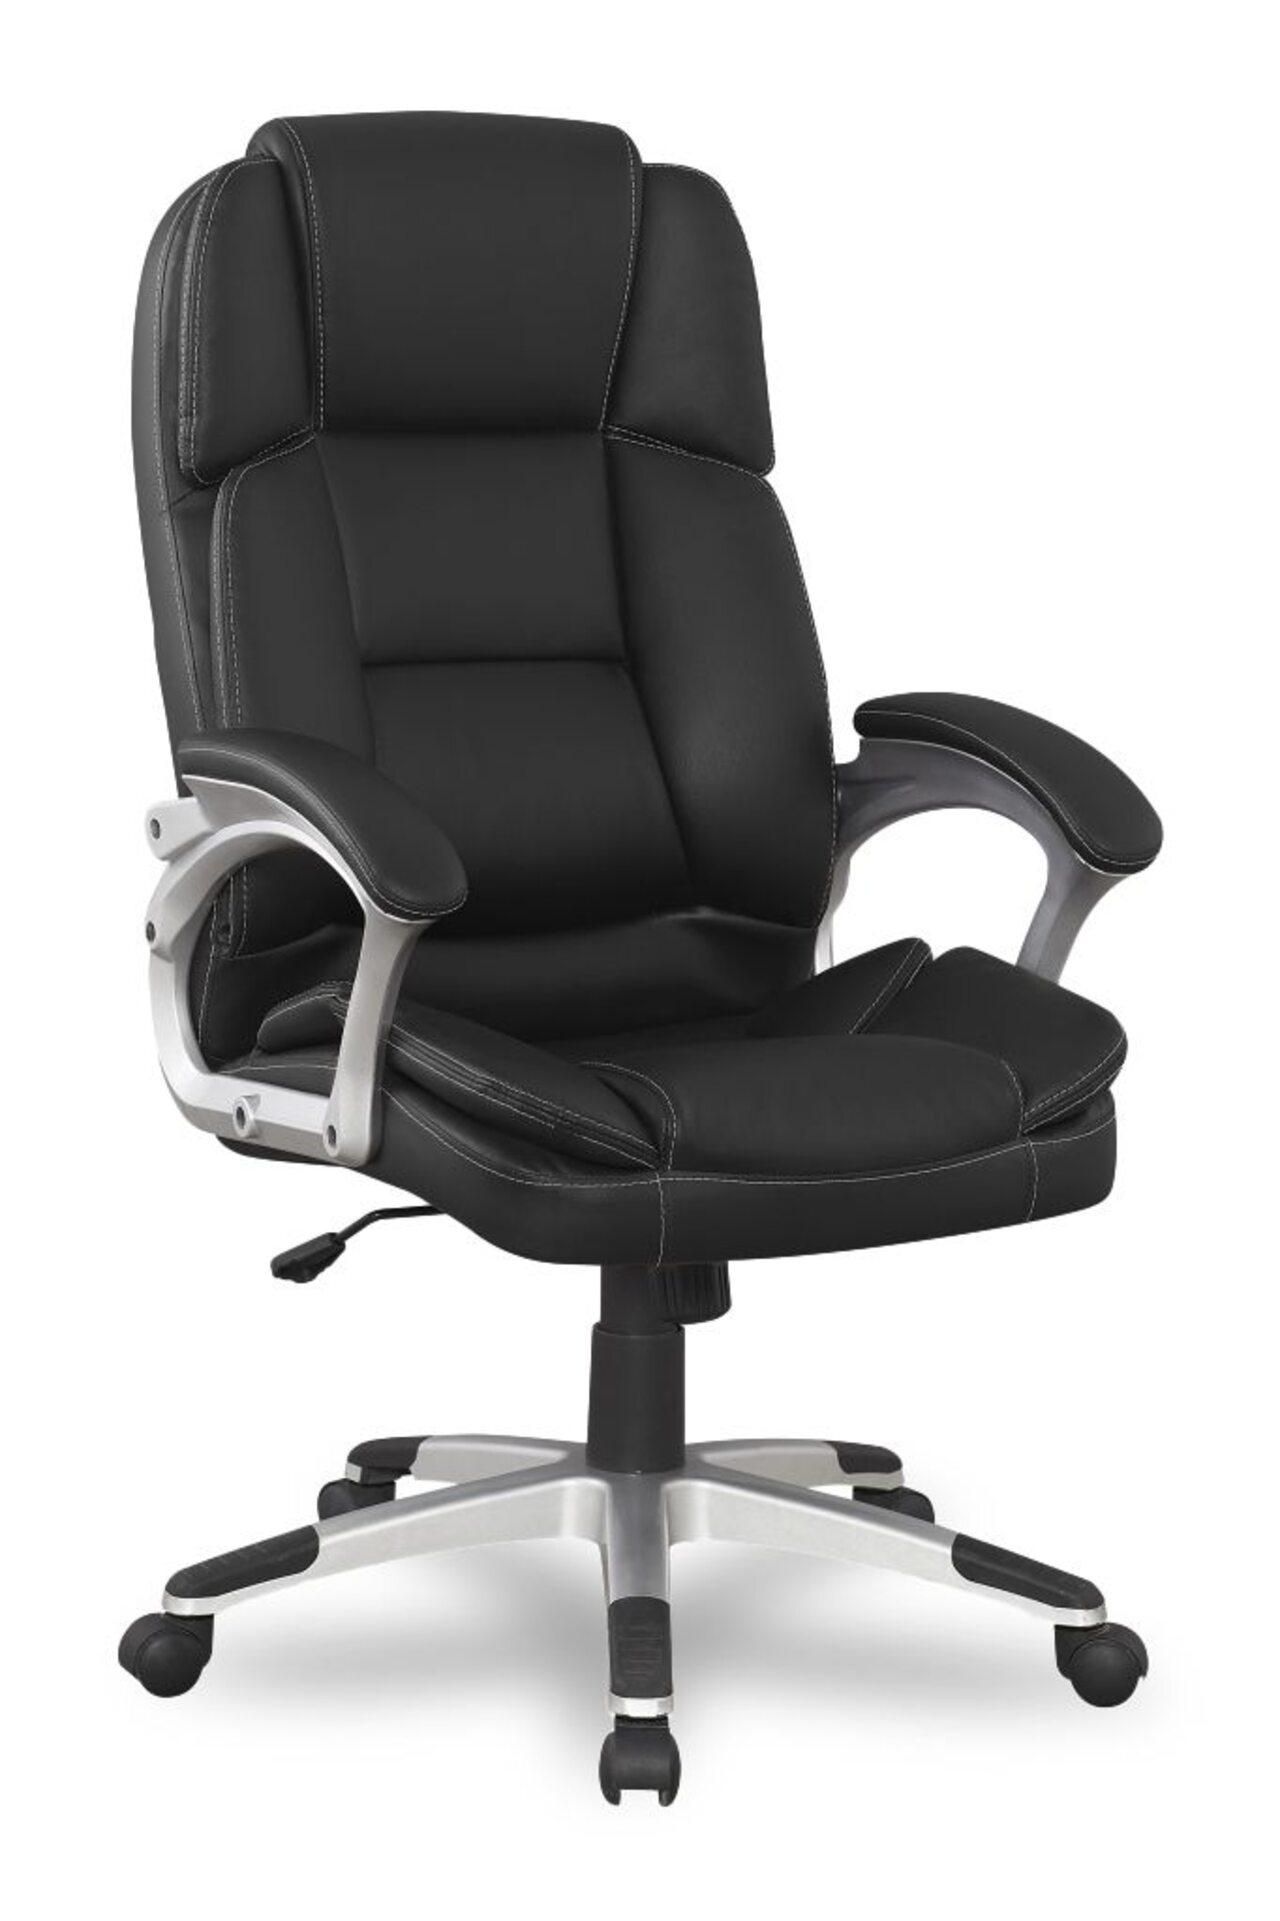 Кресло руководителя College BX-3323 - фото 2